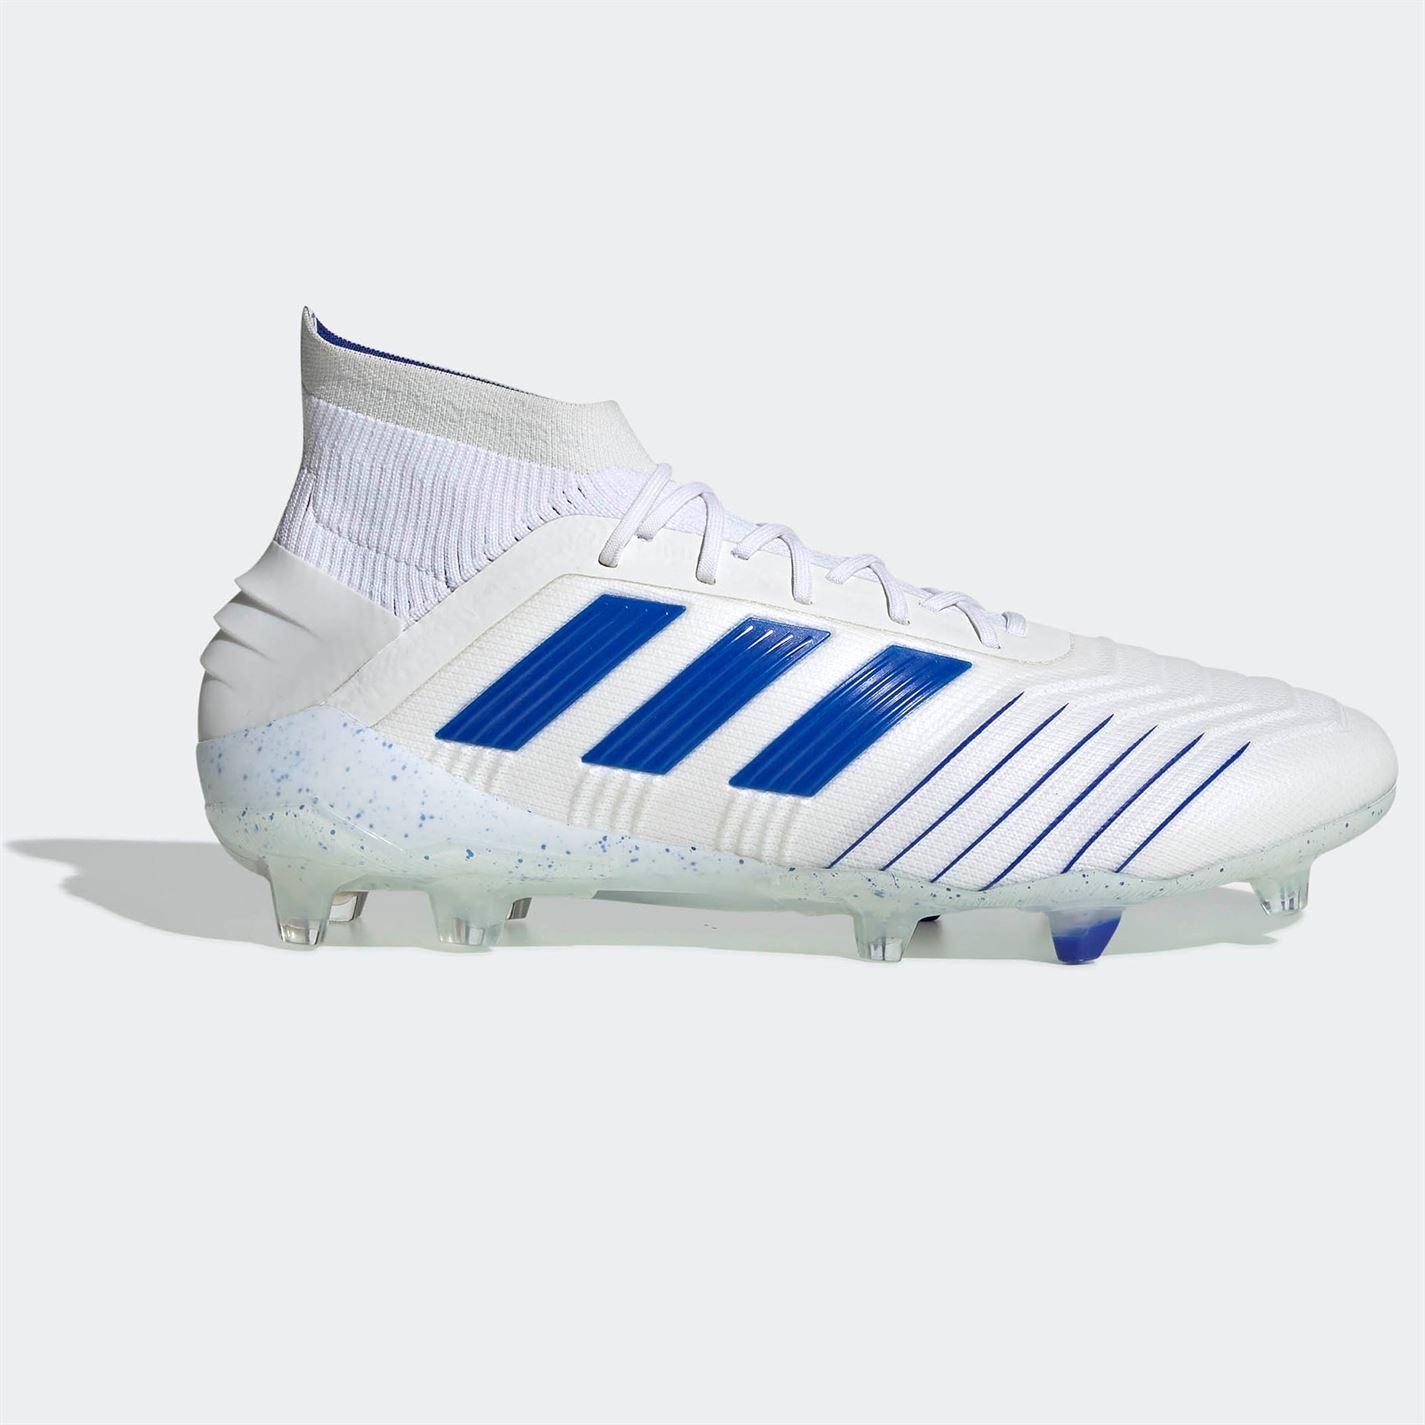 Adidas Predator 19.1 Mens FG Football Boots